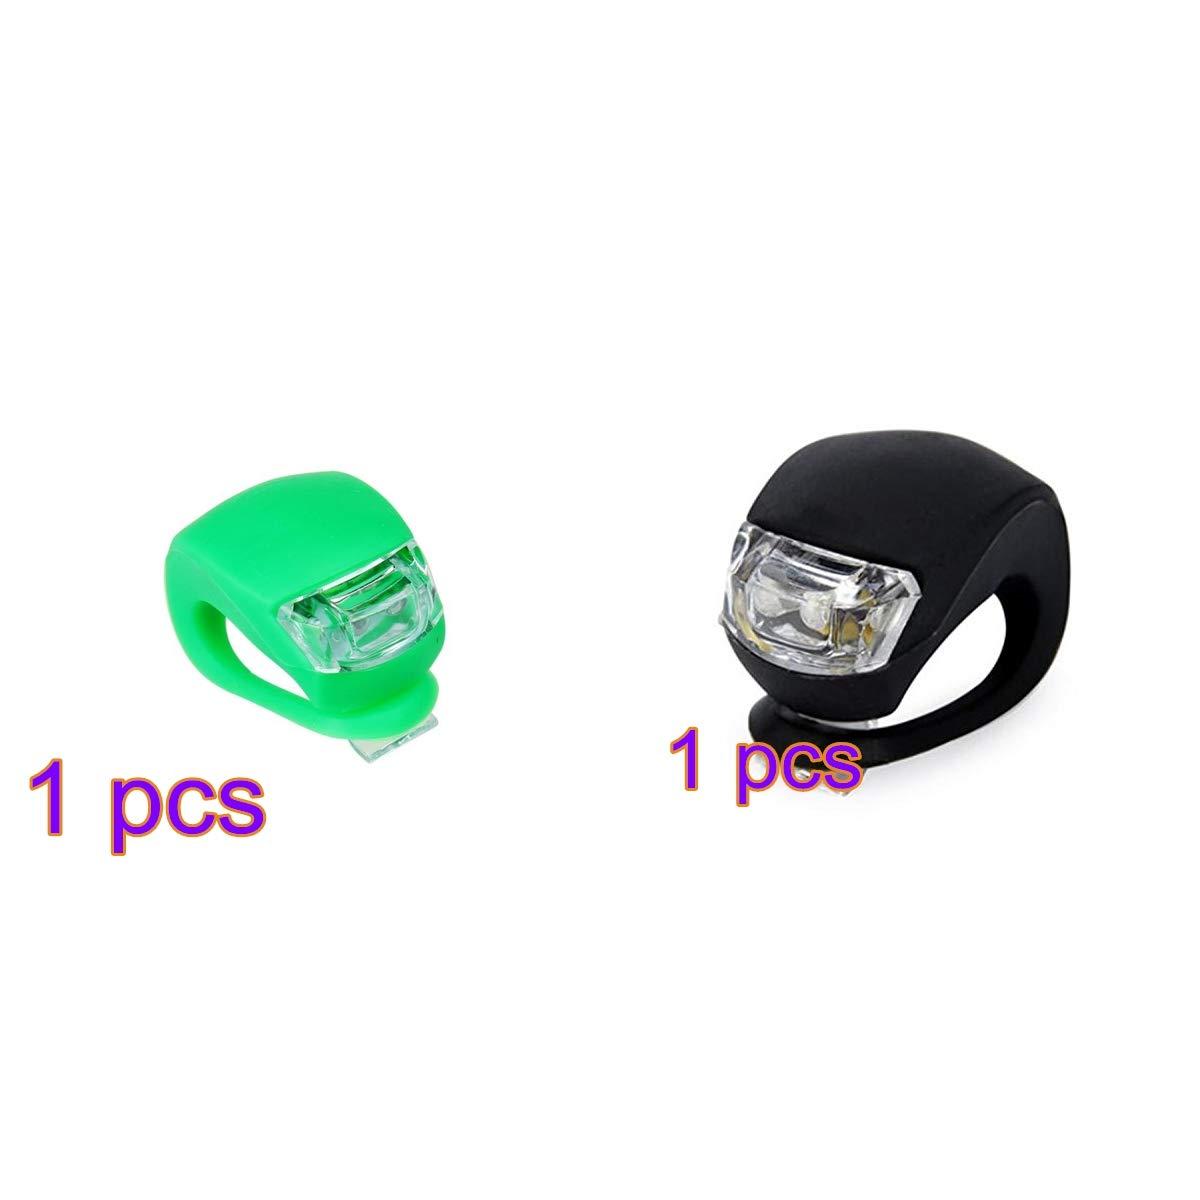 Flyyfree H-vuality-C Mini LED Silikonleuchte 2er Set